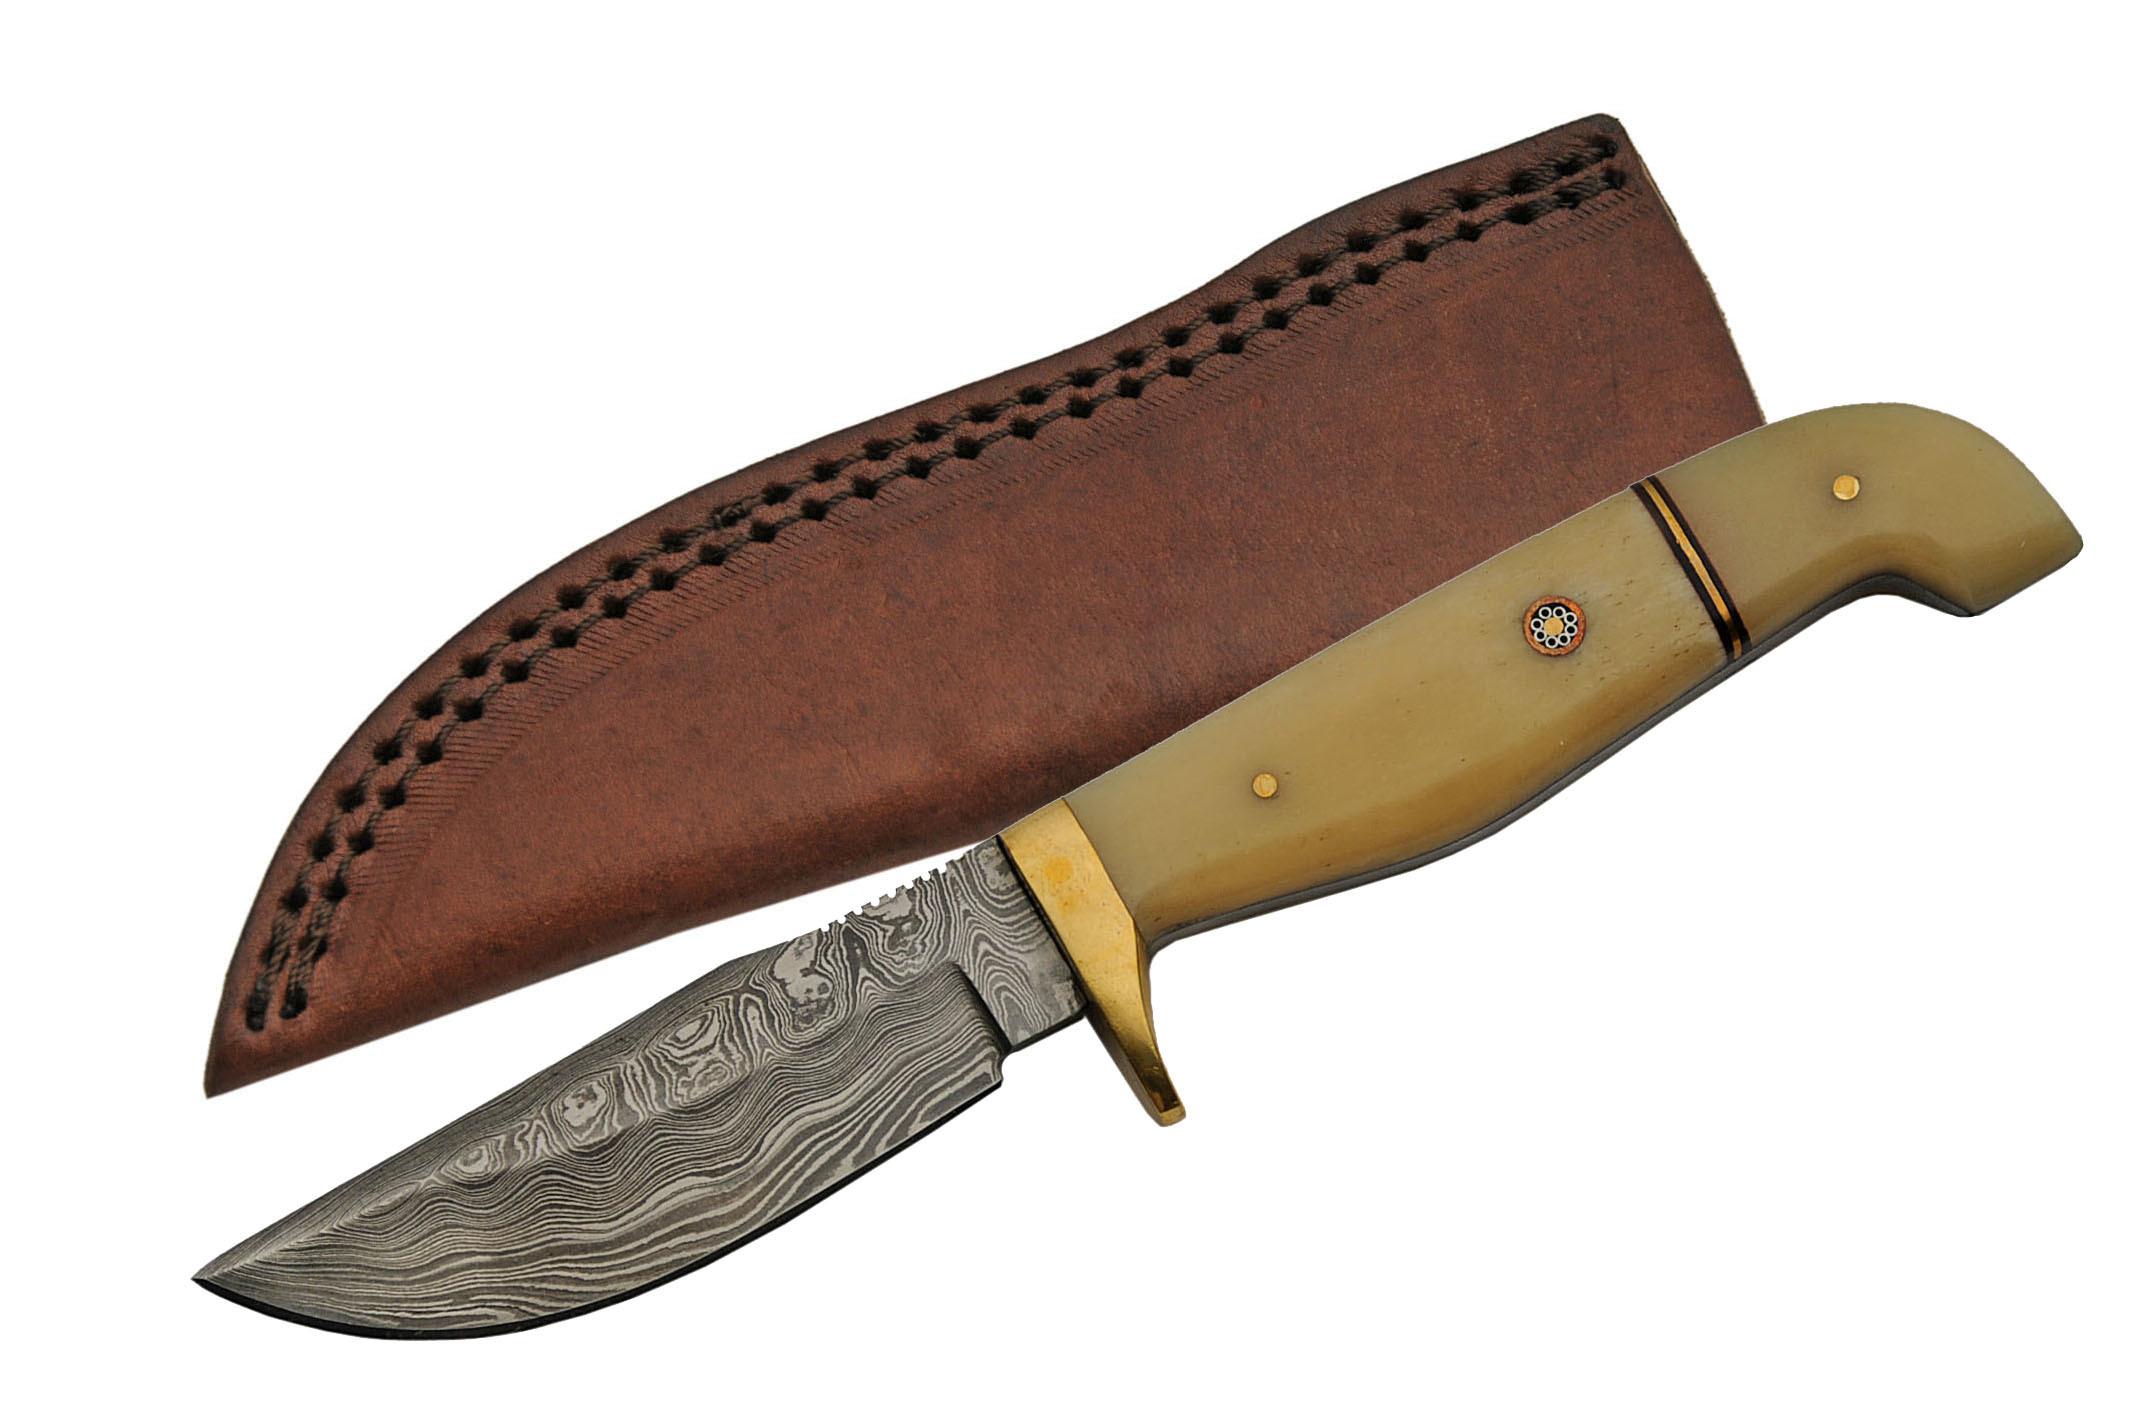 Damascus Steel Hunting Knife   8